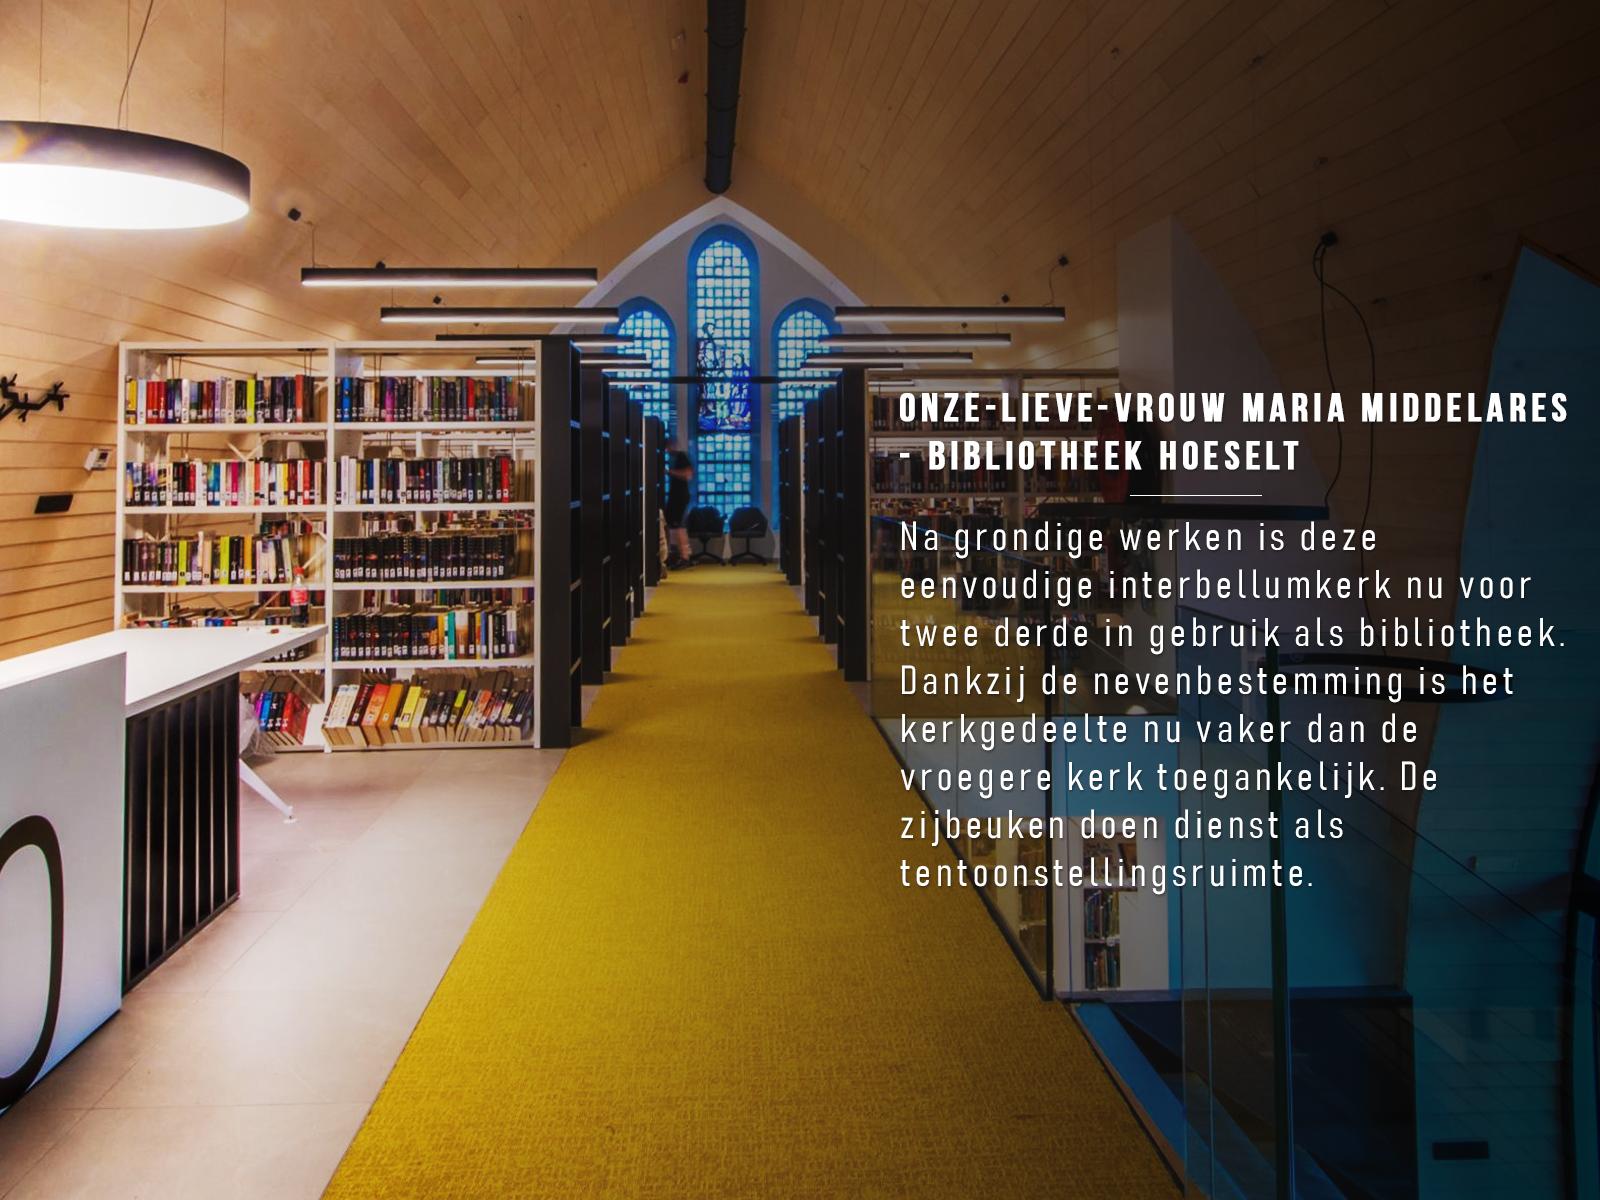 Onze-Lieve-Vrouw Maria Middelares - Bibliotheek Hoeselt © Foto Simonne Wouters